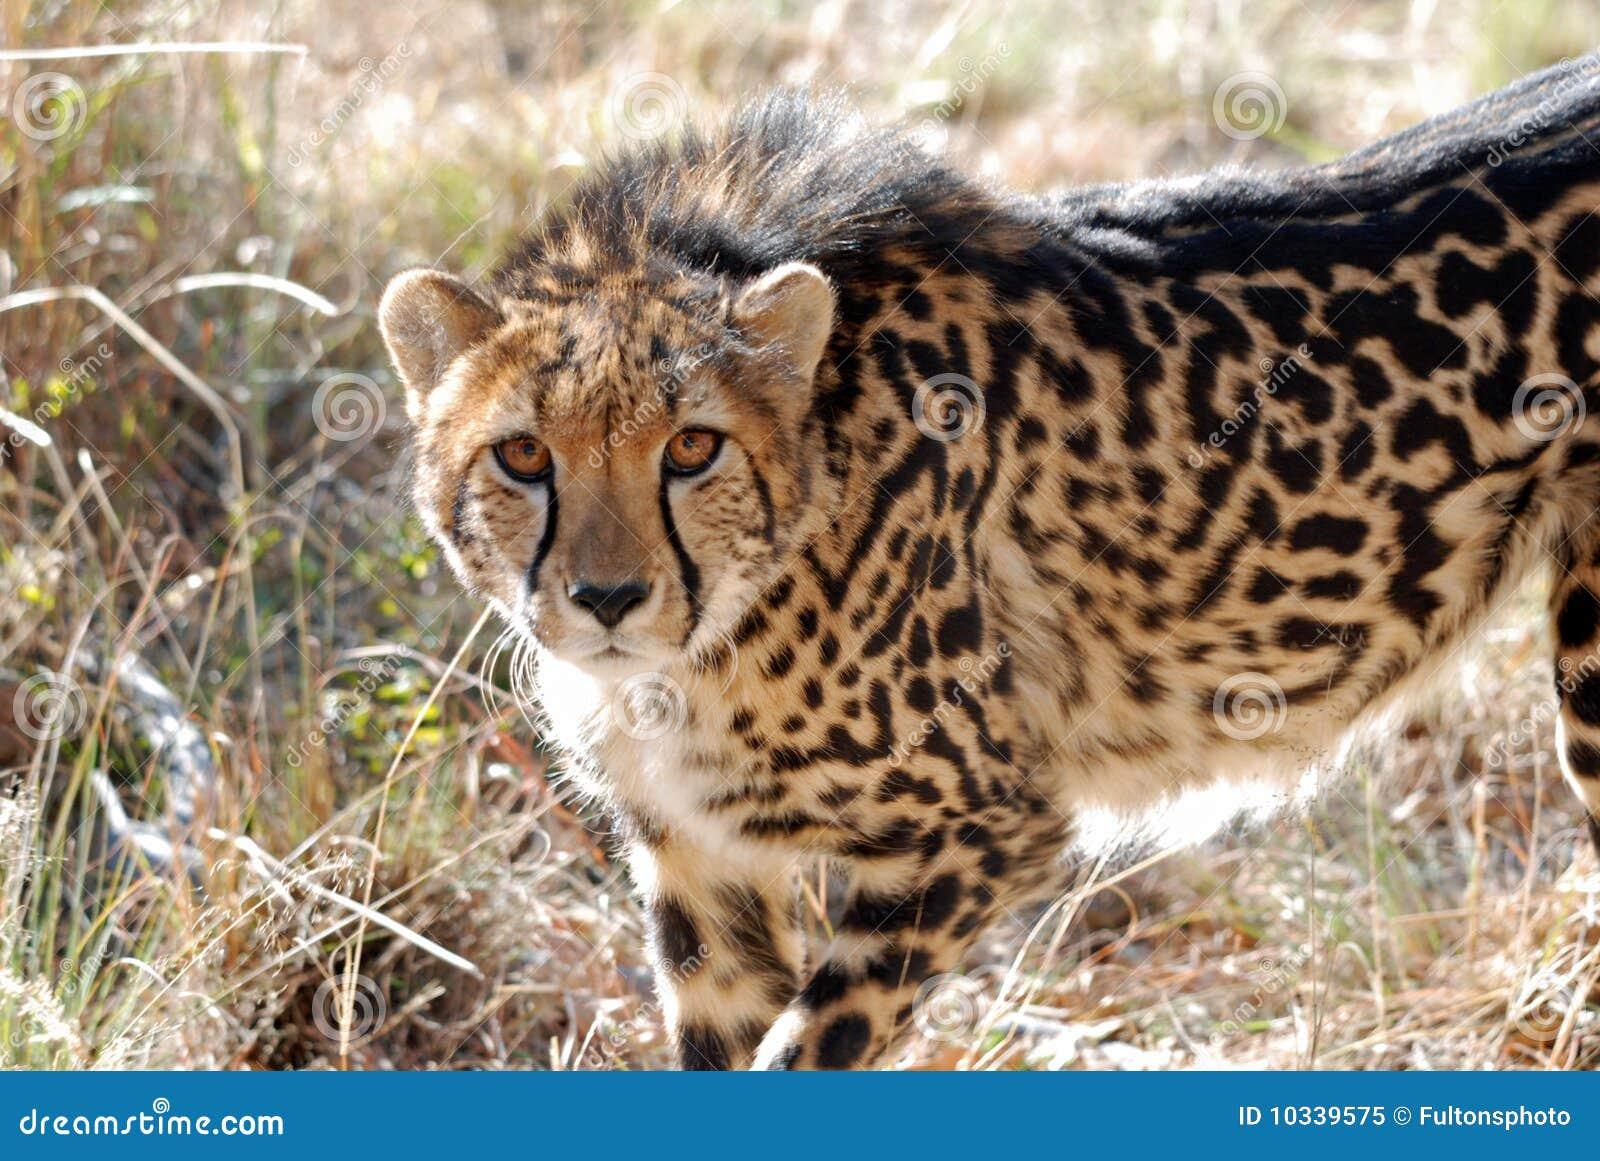 Cheetahlag dess unika konungmodelluppvisning